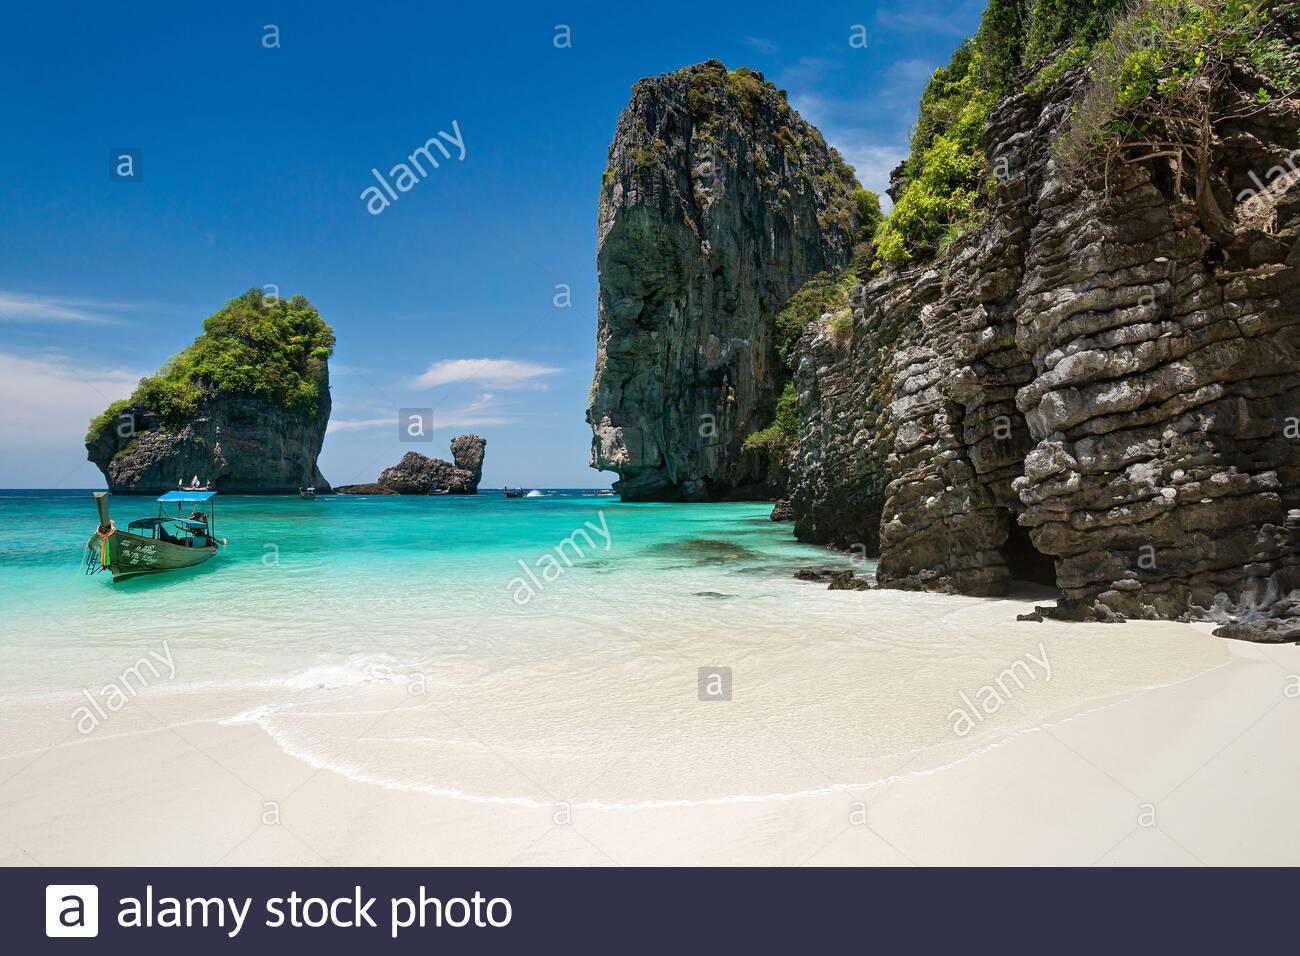 koh-phi-phi-don-island-lana-bay-thailand